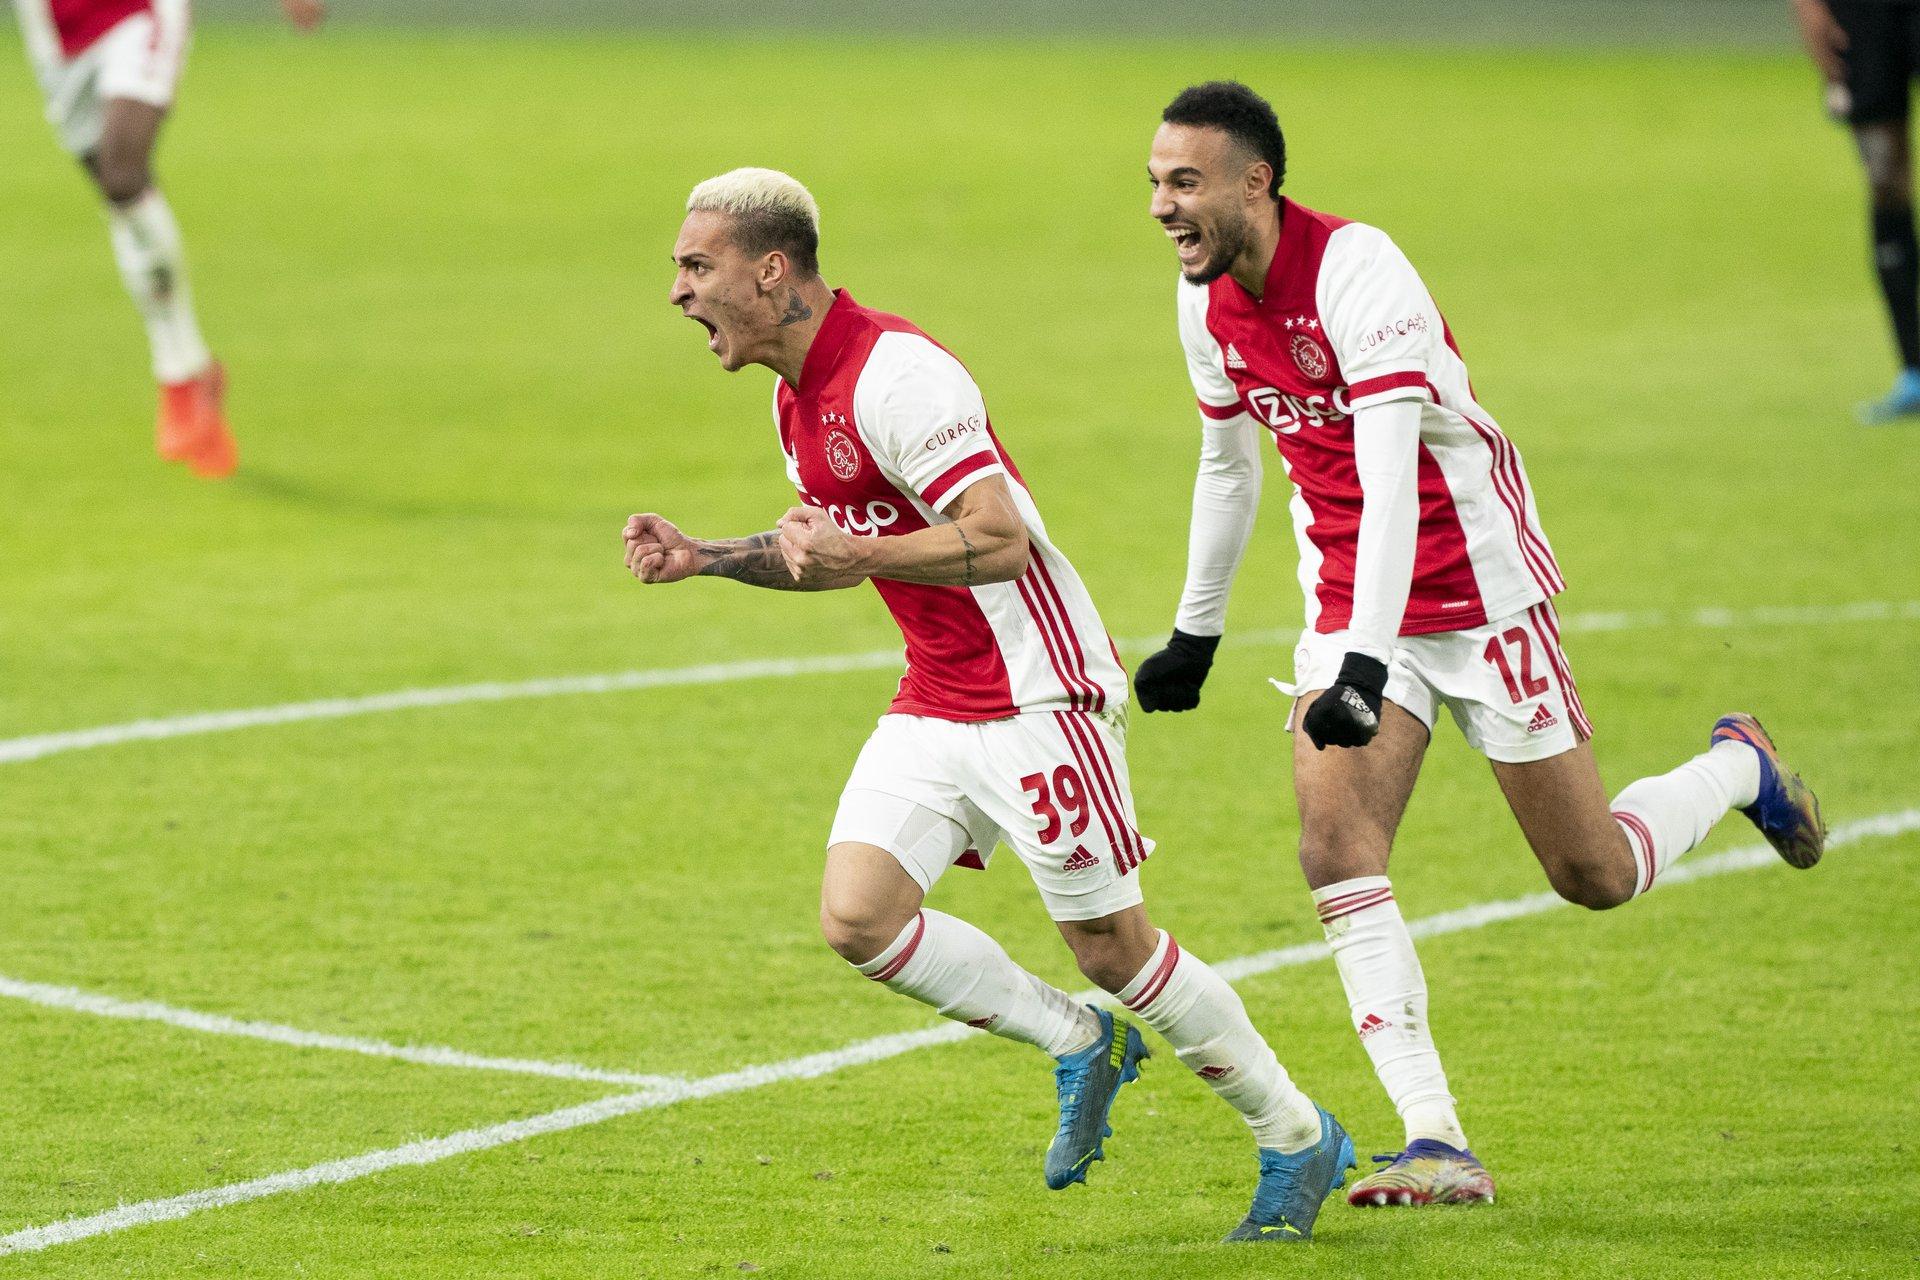 https://www.vodafoneziggo.nl/media/images/2021-01-10_Ajax_-_PSV_0337_KEUZE.width-1920.jpg